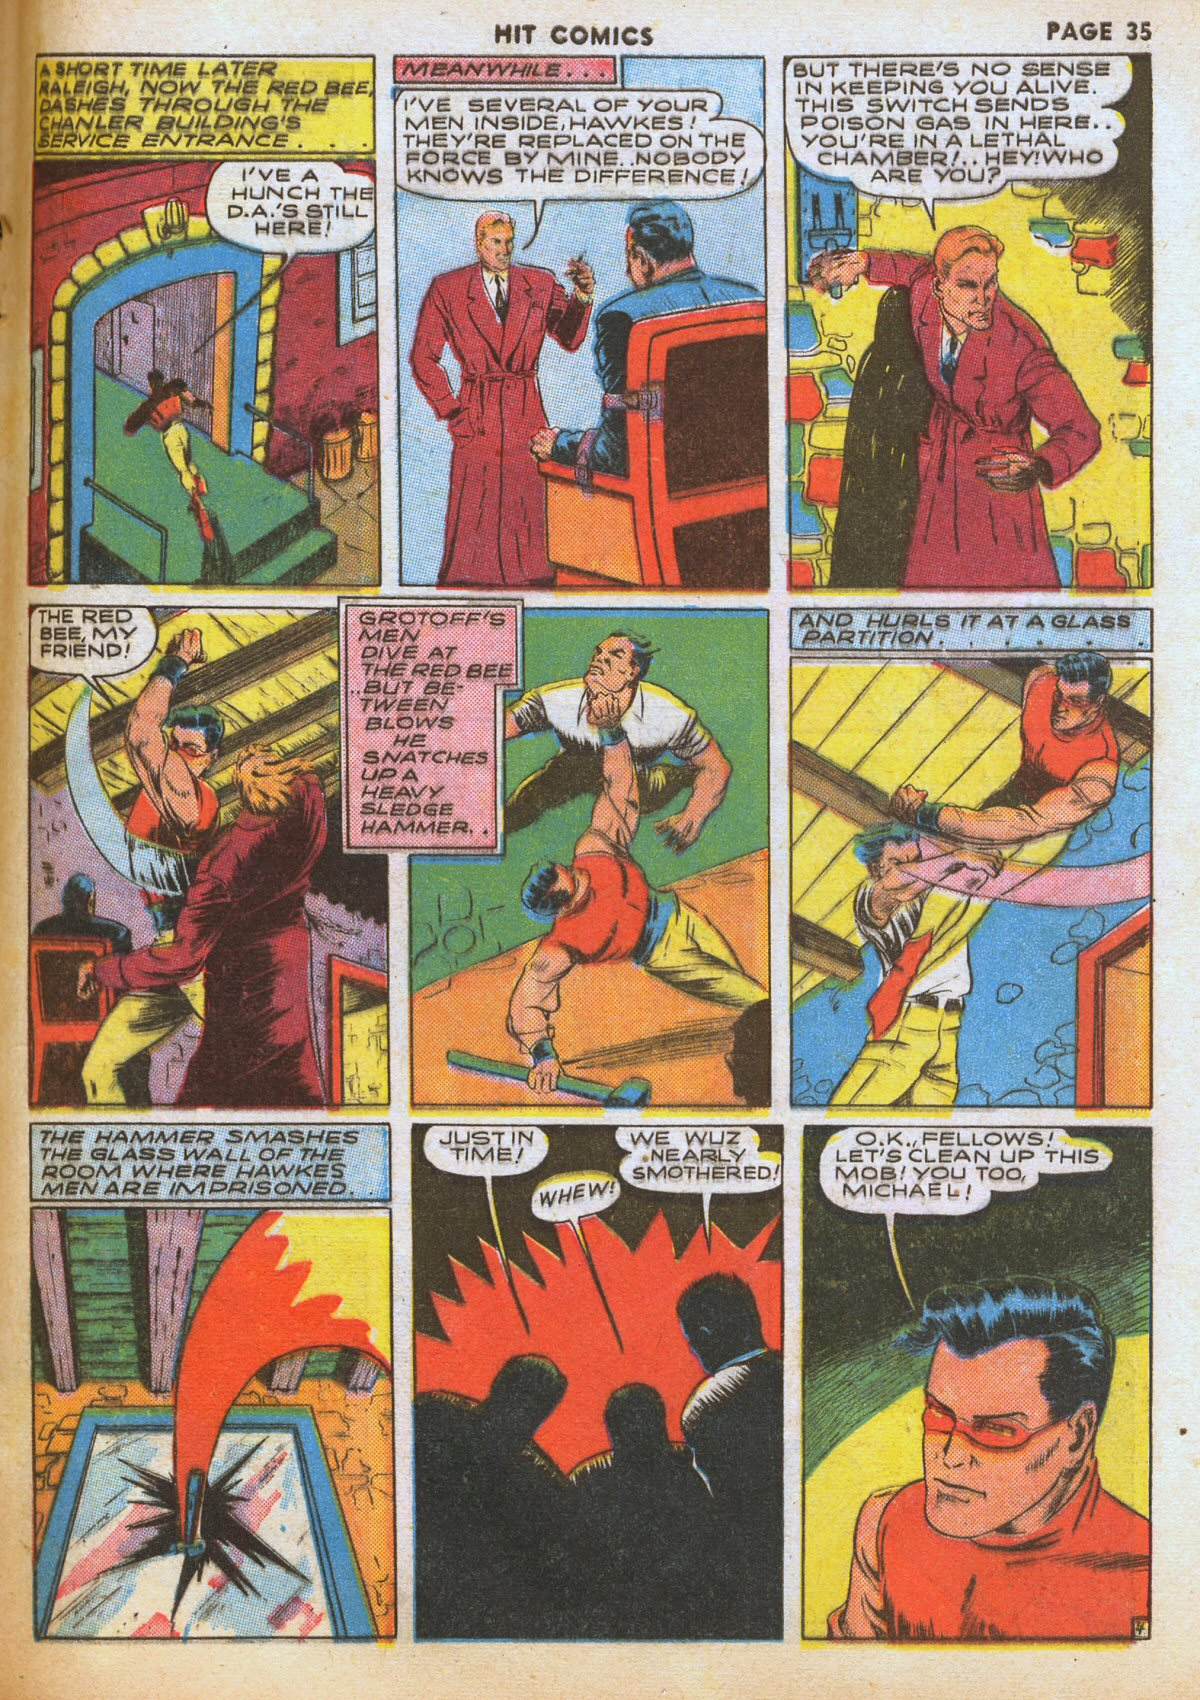 Read online Hit Comics comic -  Issue #12 - 37